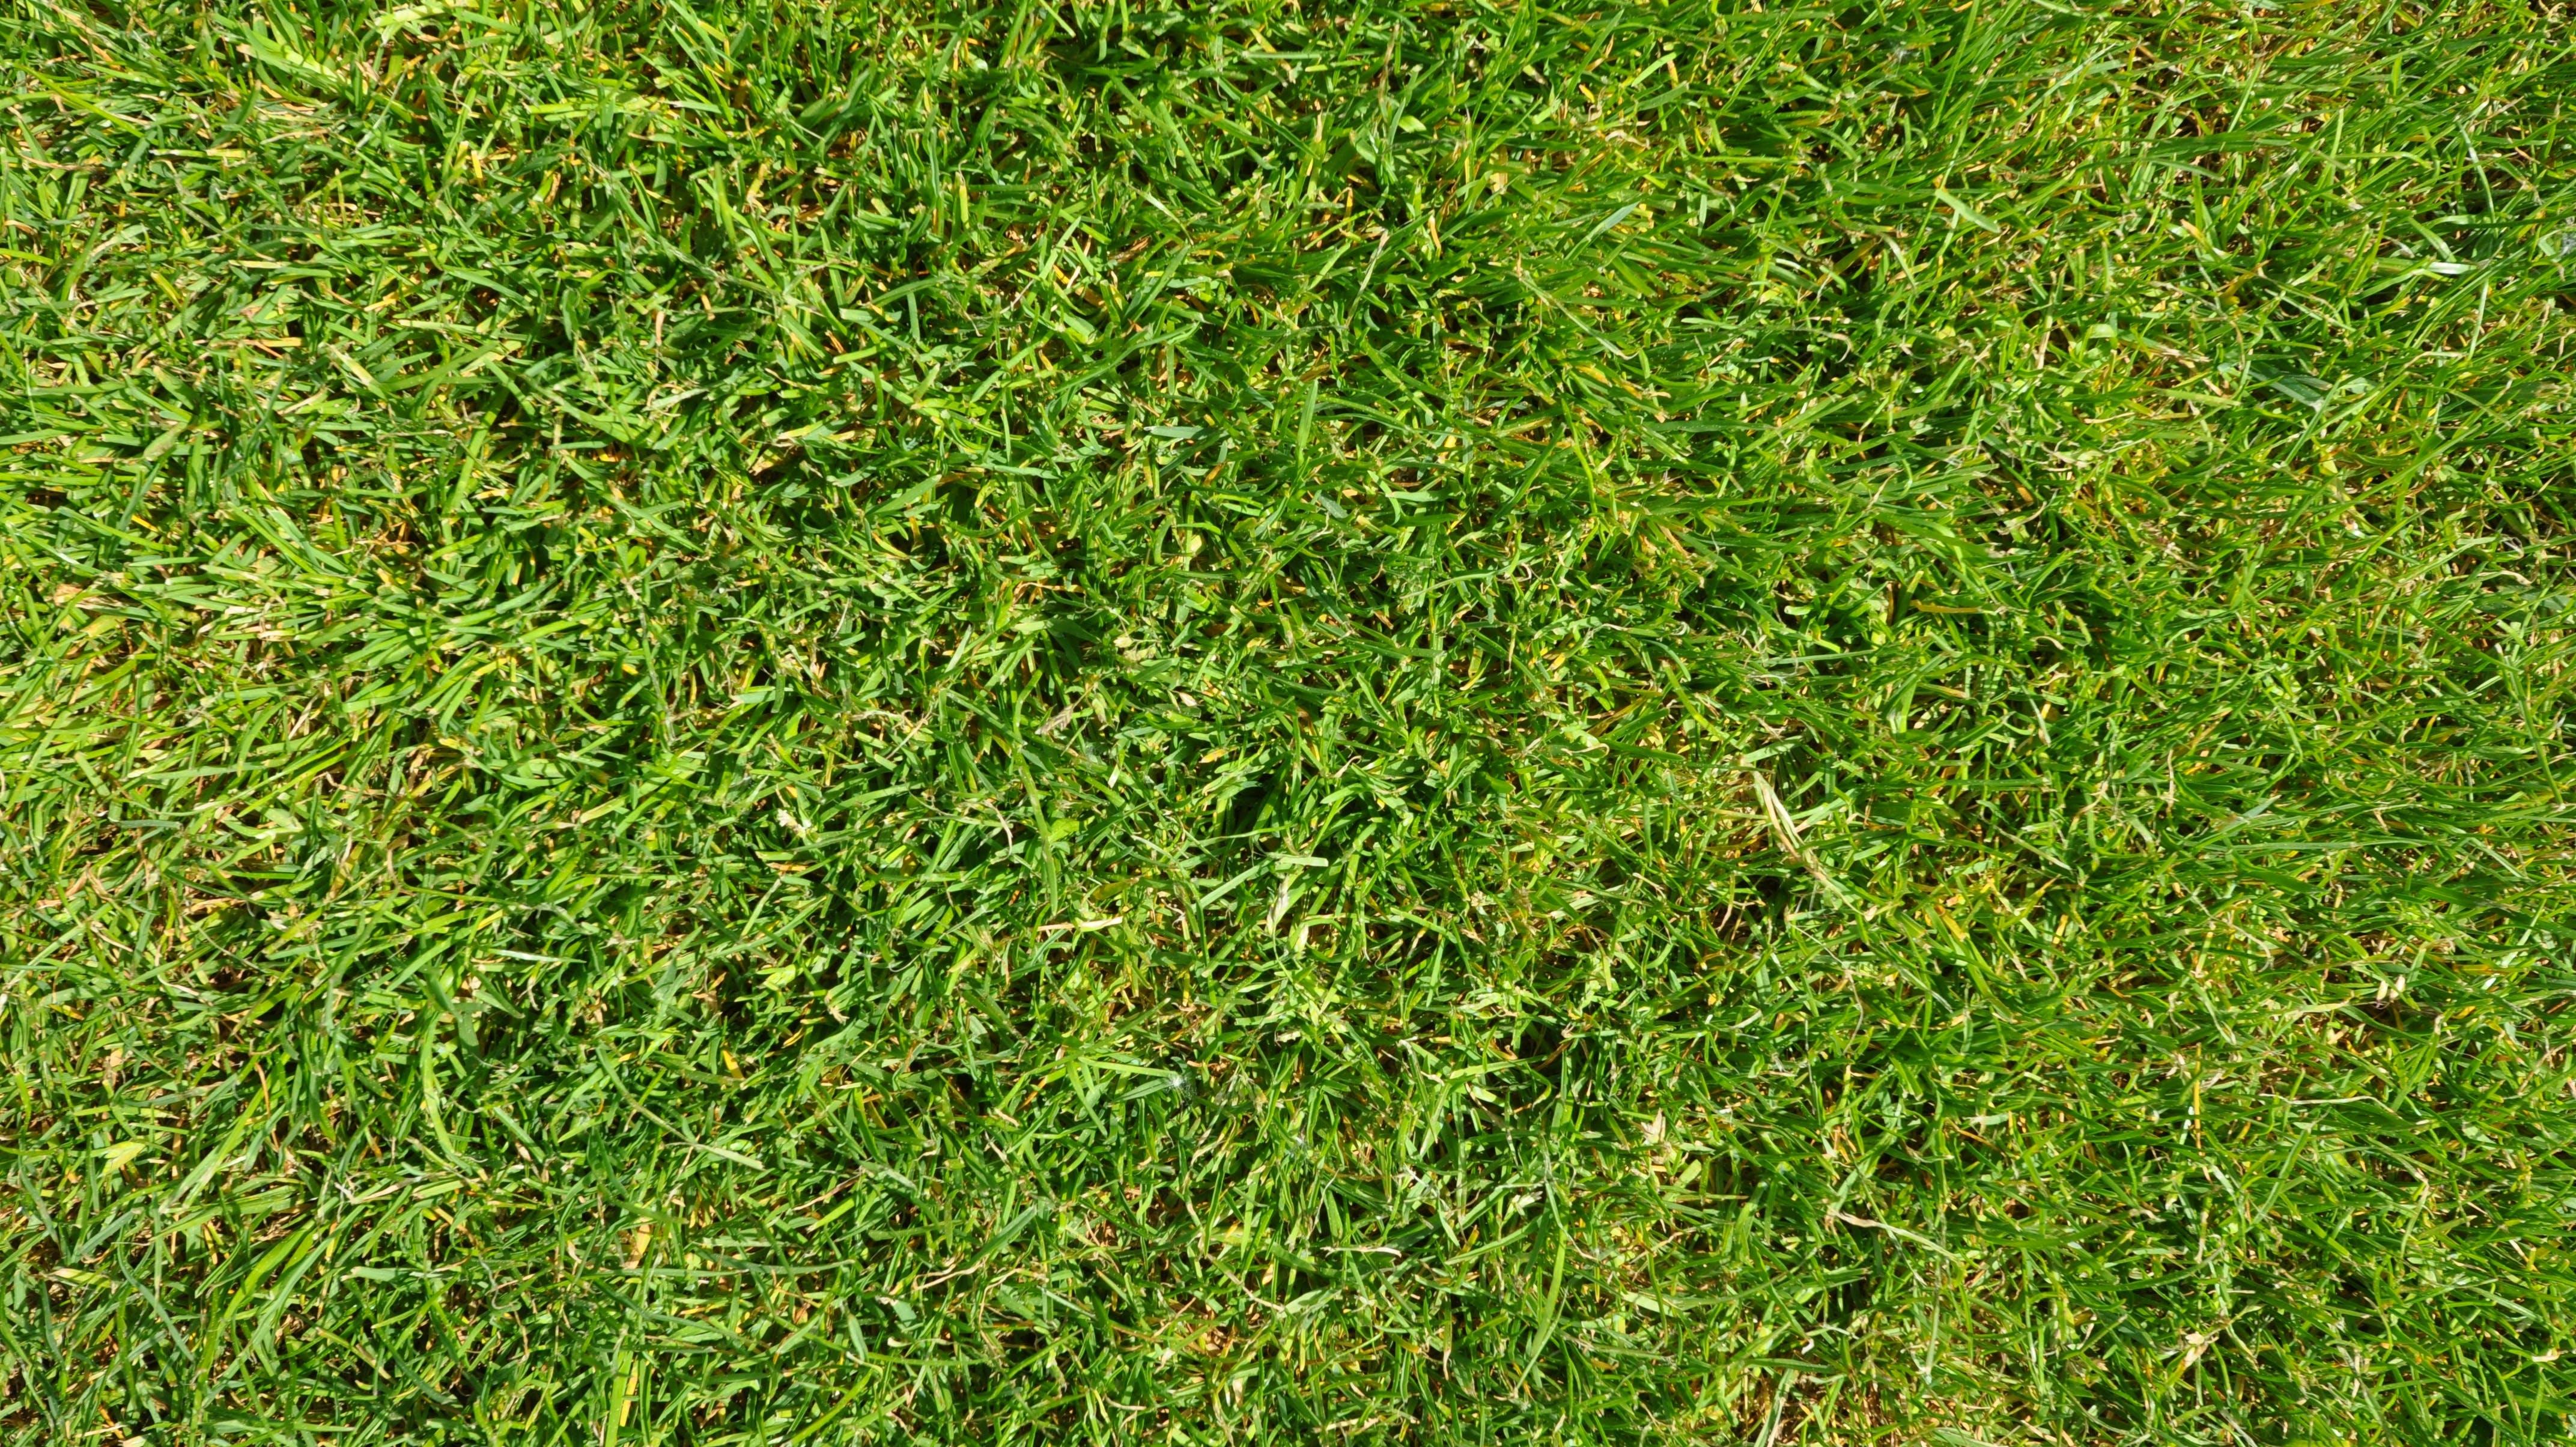 Free stock photo of texture, grass, green, football